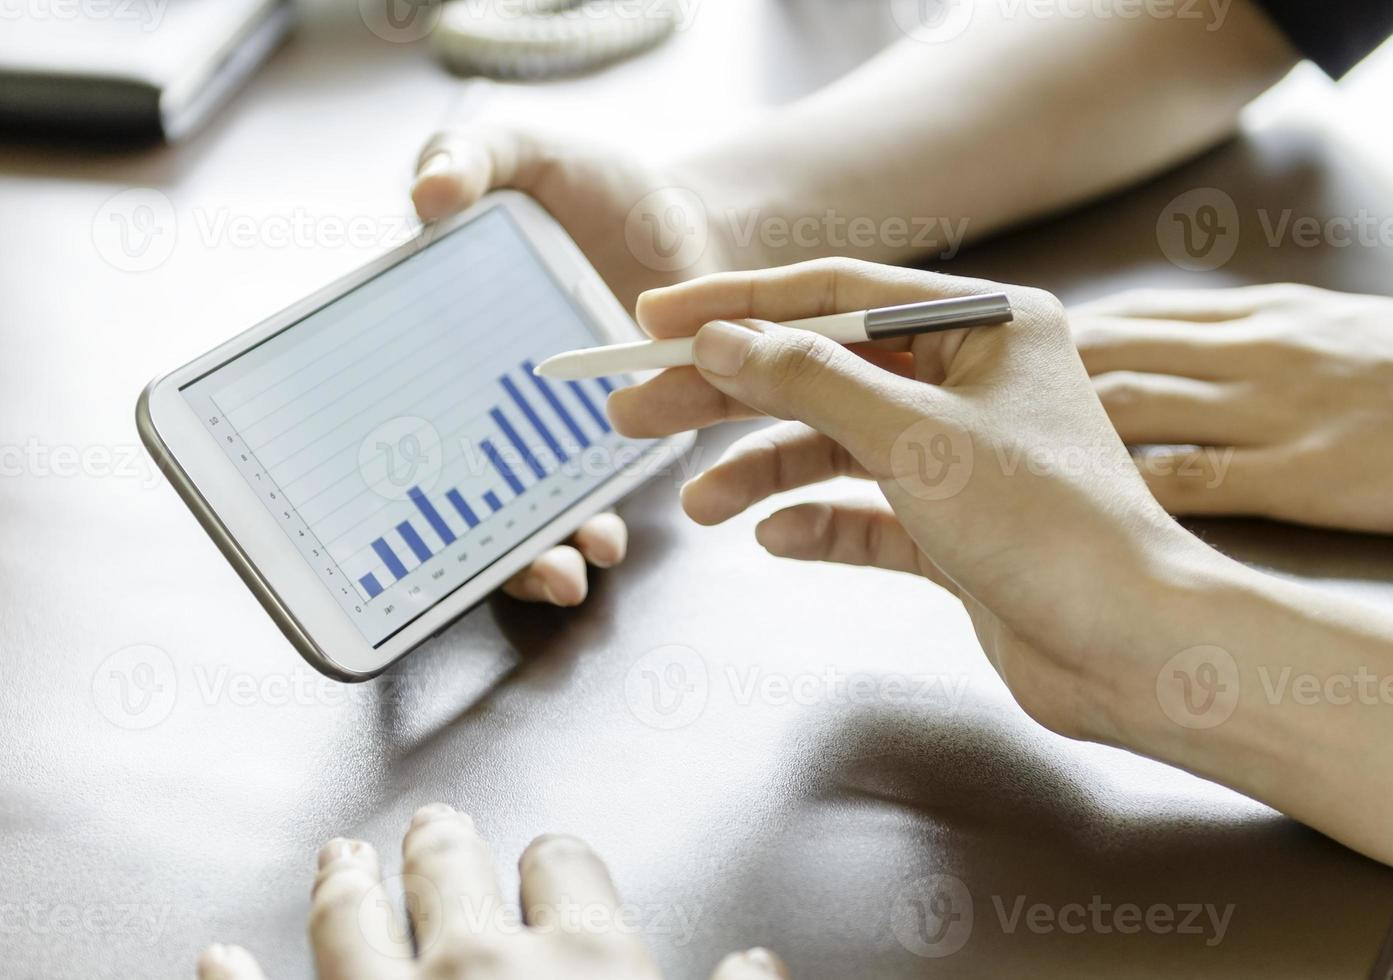 femmes, utilisation, tablette, stylet, stylo photo